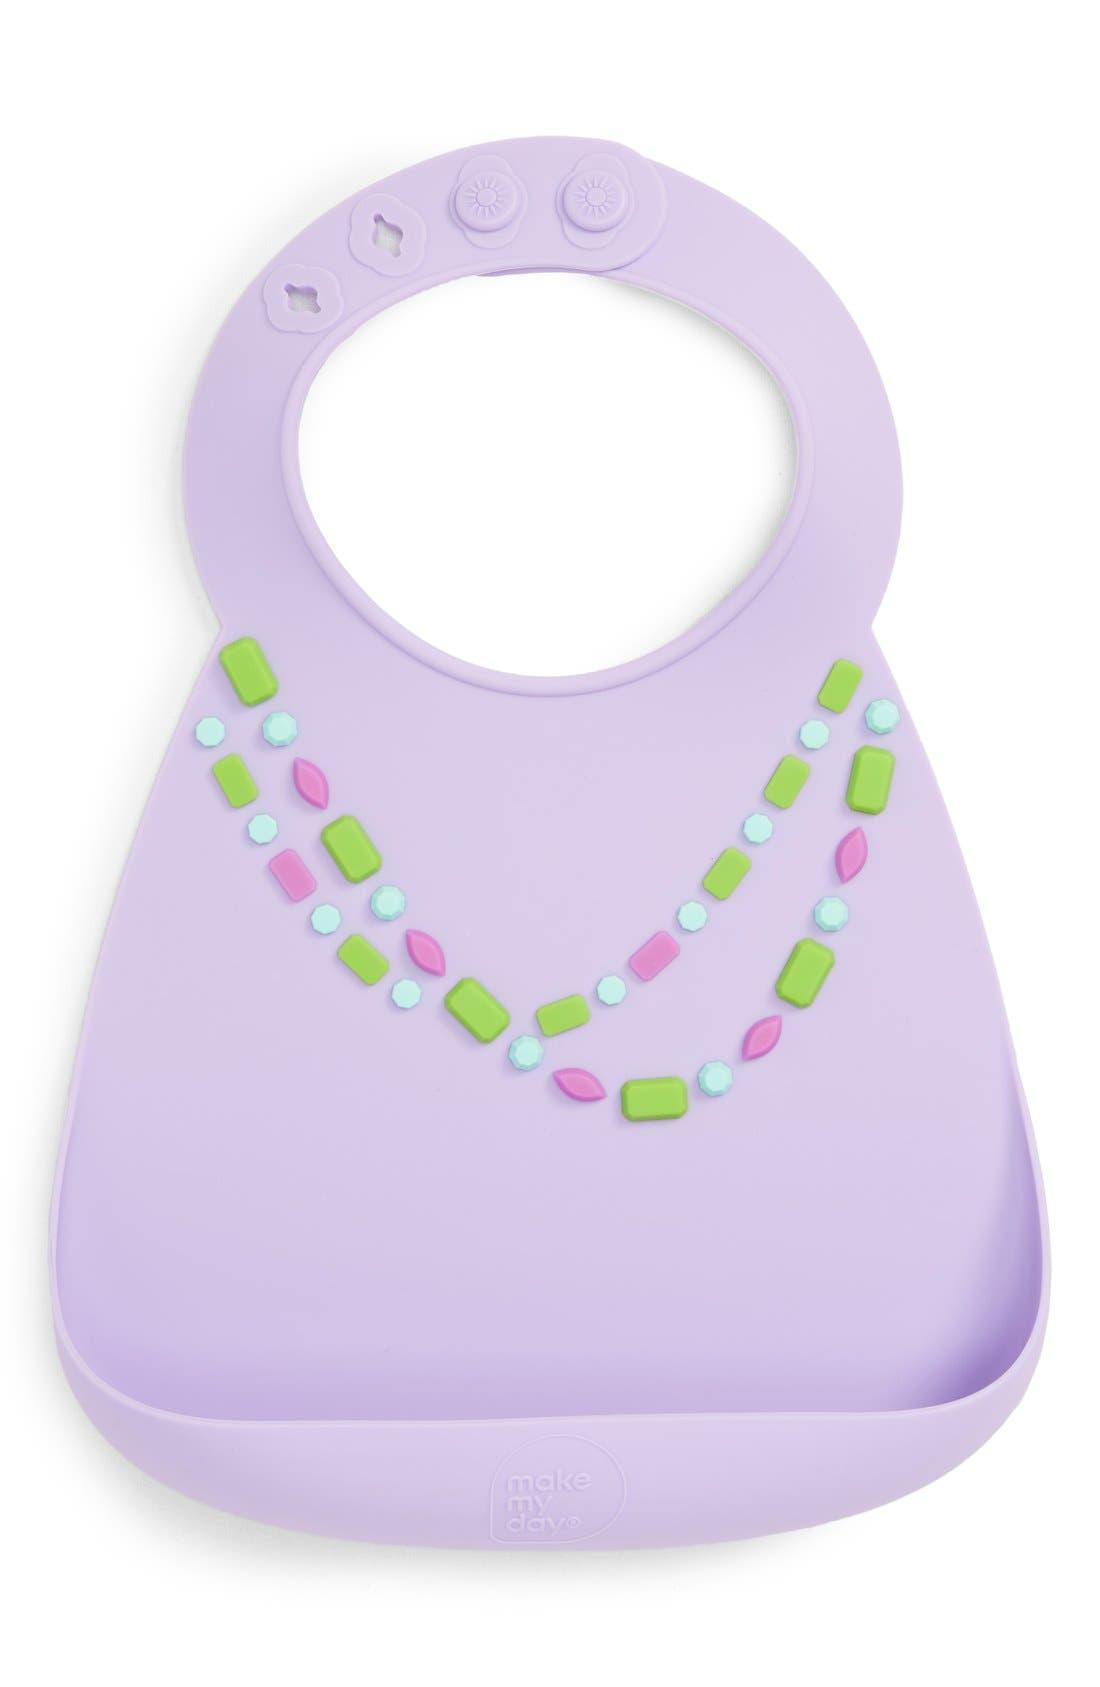 'For a Lil Sparkle' Bib,                         Main,                         color, JEWEL